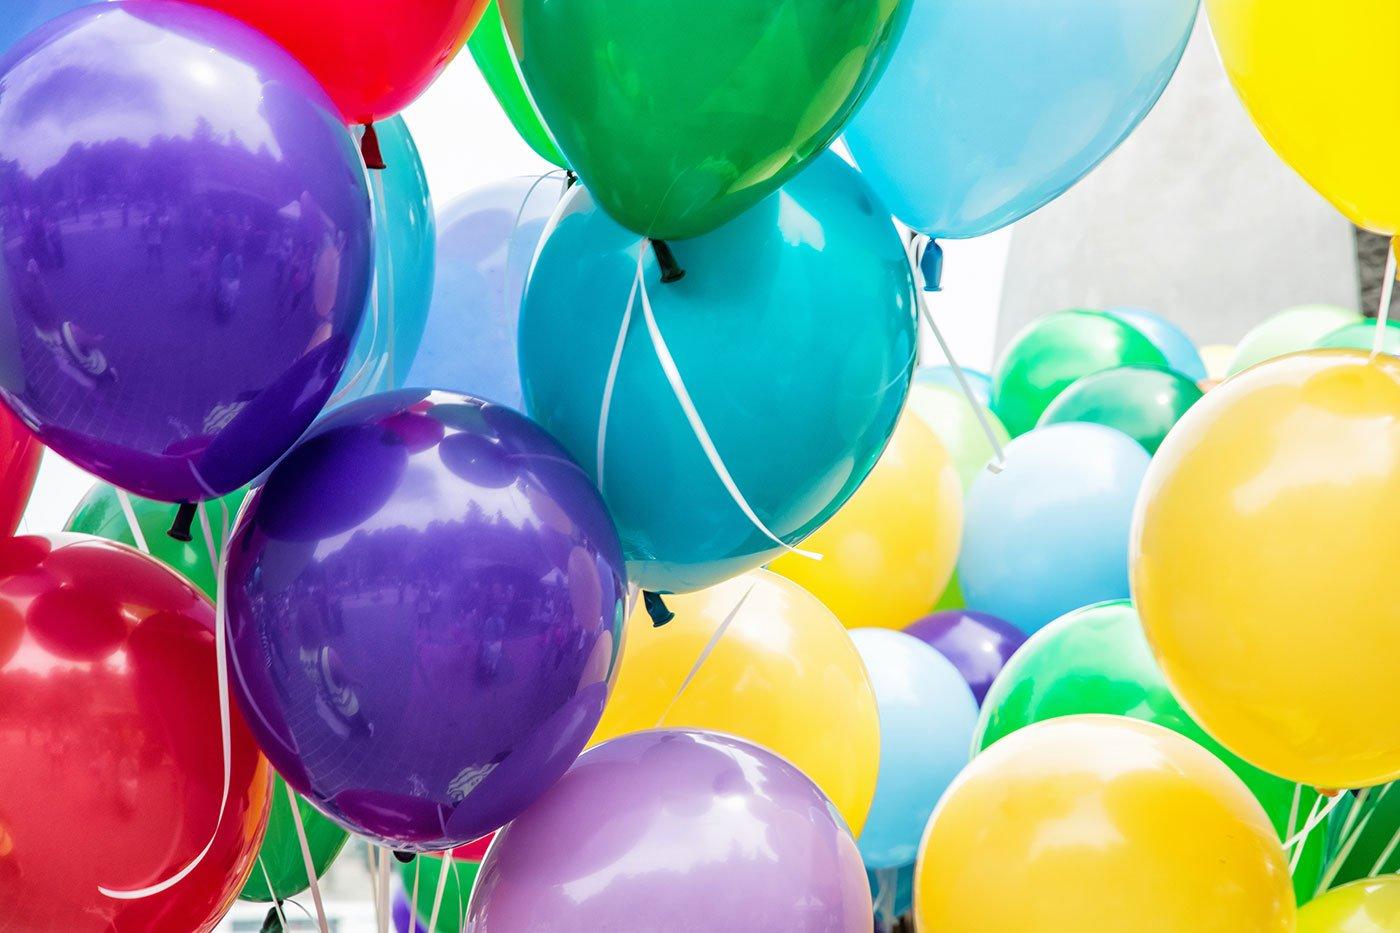 Un insieme di palloncini di vari colori